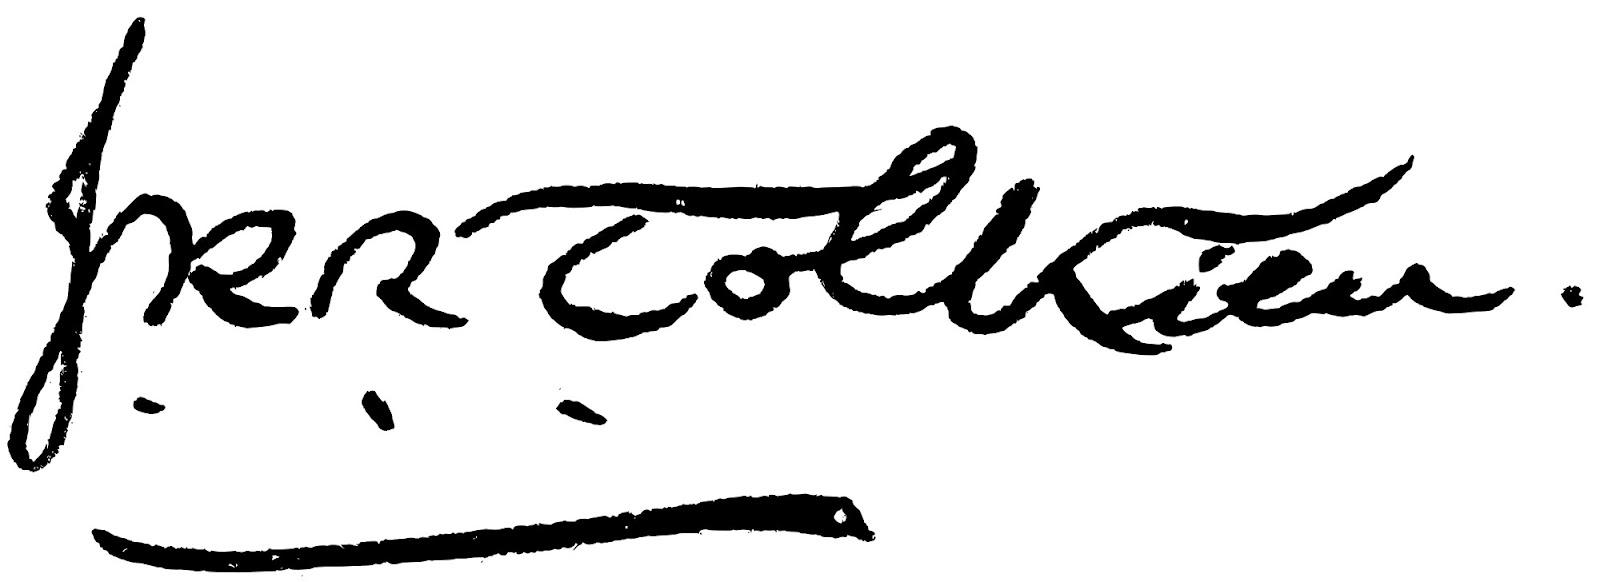 Jrr tolkien symbol transparent nornasfo therezhada john ronald reuel tolkien jrr tolkien symbol transparent biocorpaavc Choice Image